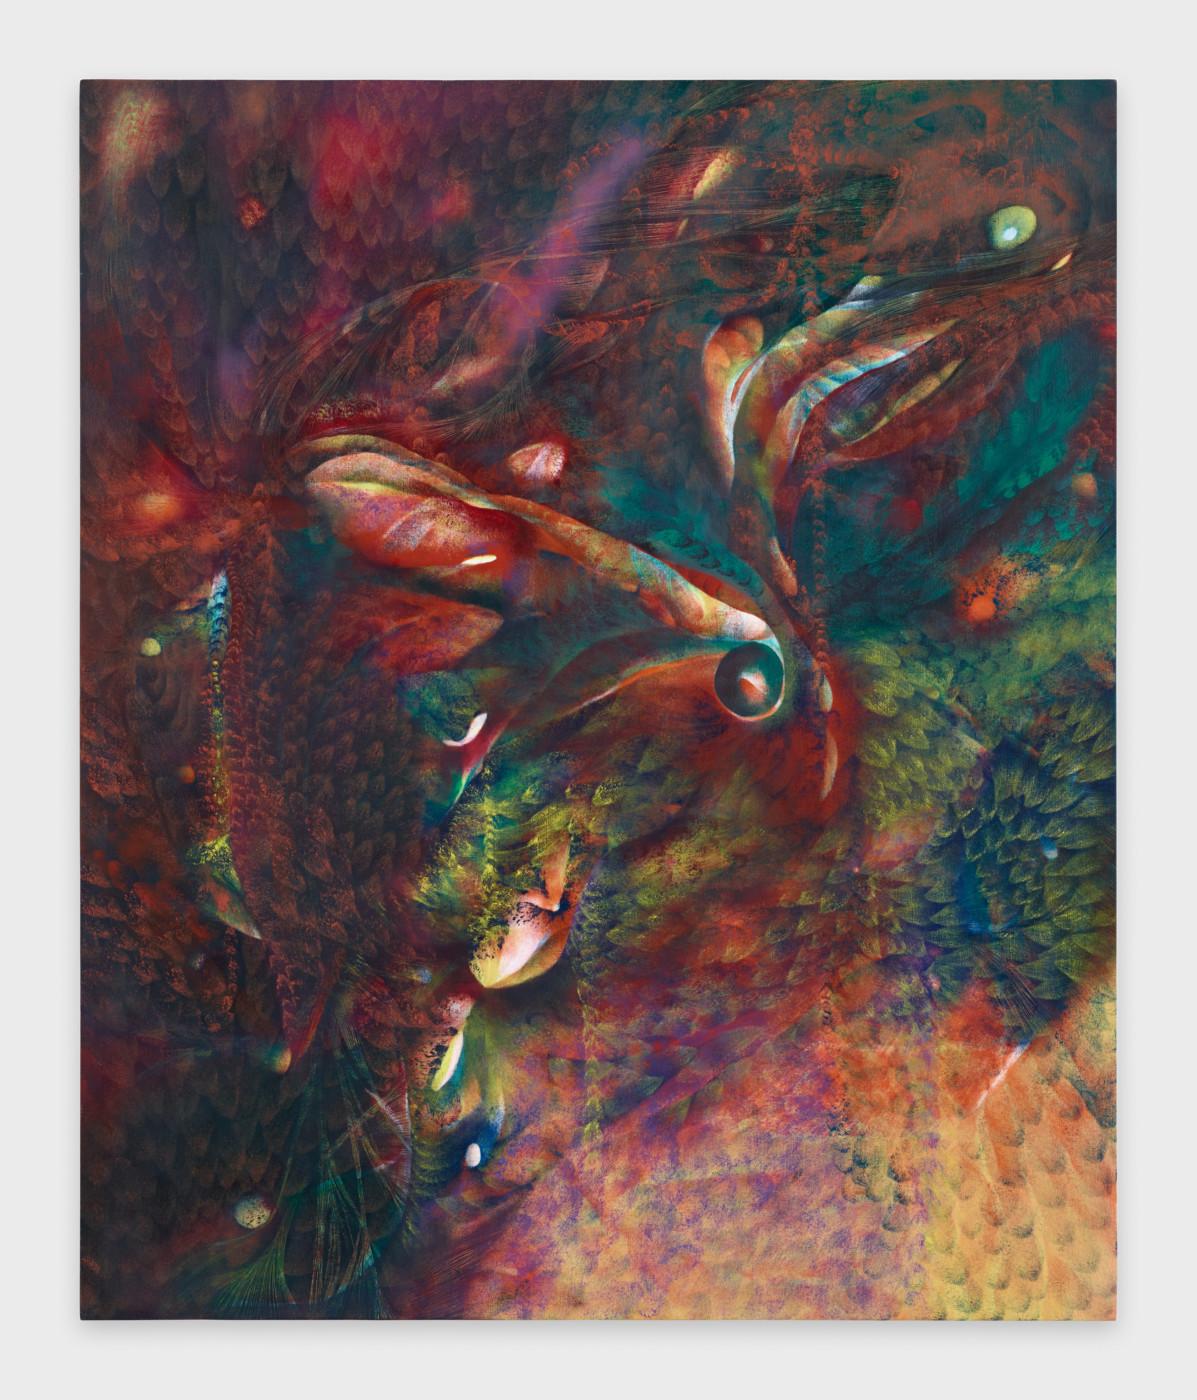 LUCY BULL  Light Rain , 2019 Oil on linen 152,5 x 127 x 4 cm / 60 x 50 x 1.5 in - High Art Gallery Paris